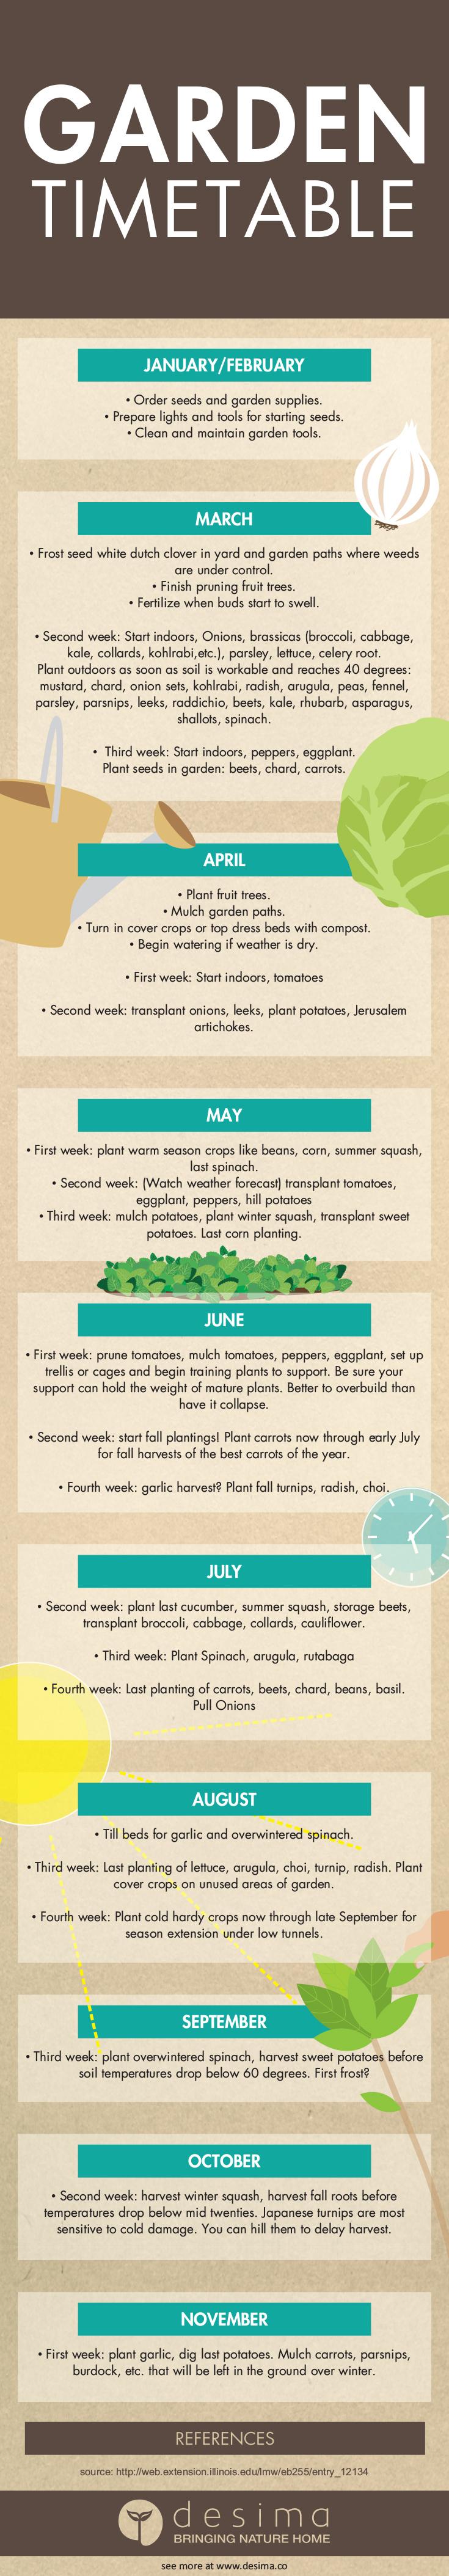 Garden Timetable Infographic